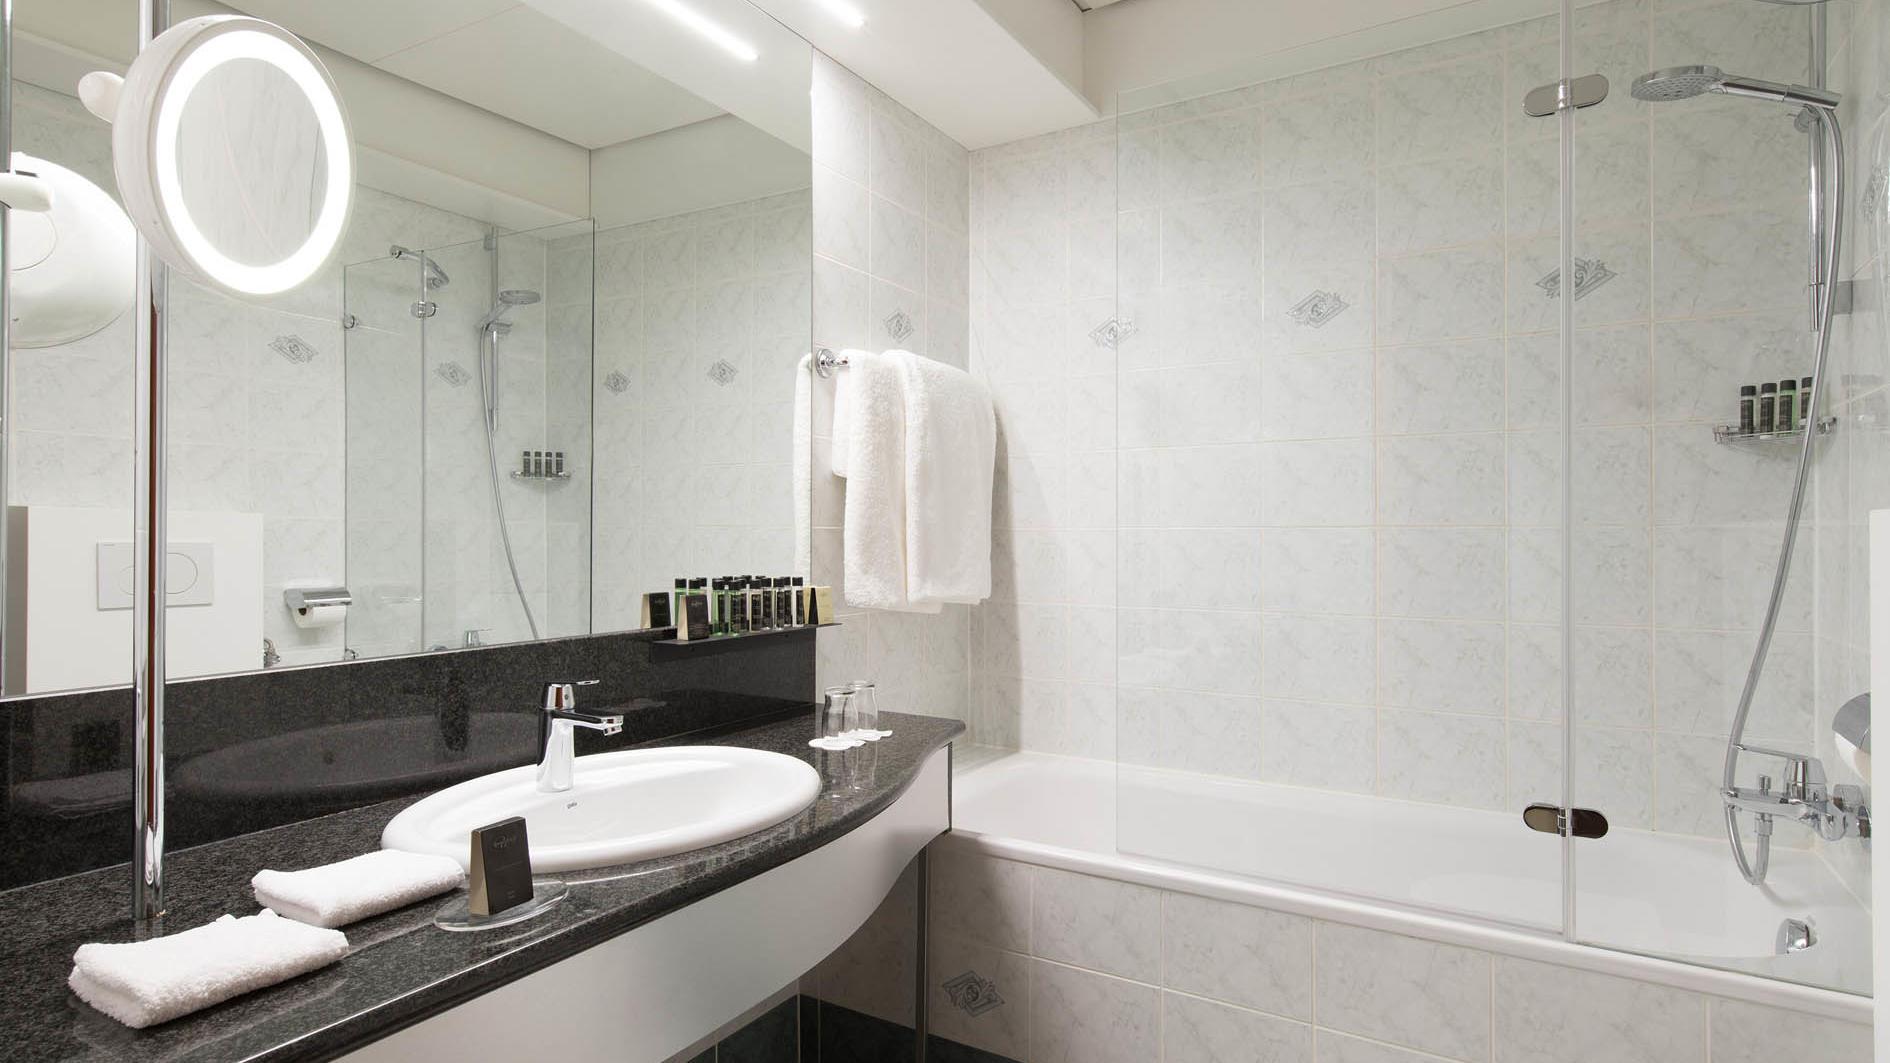 Double Room Castle View Bathroom at Grand Hotel Union in Ljubljana